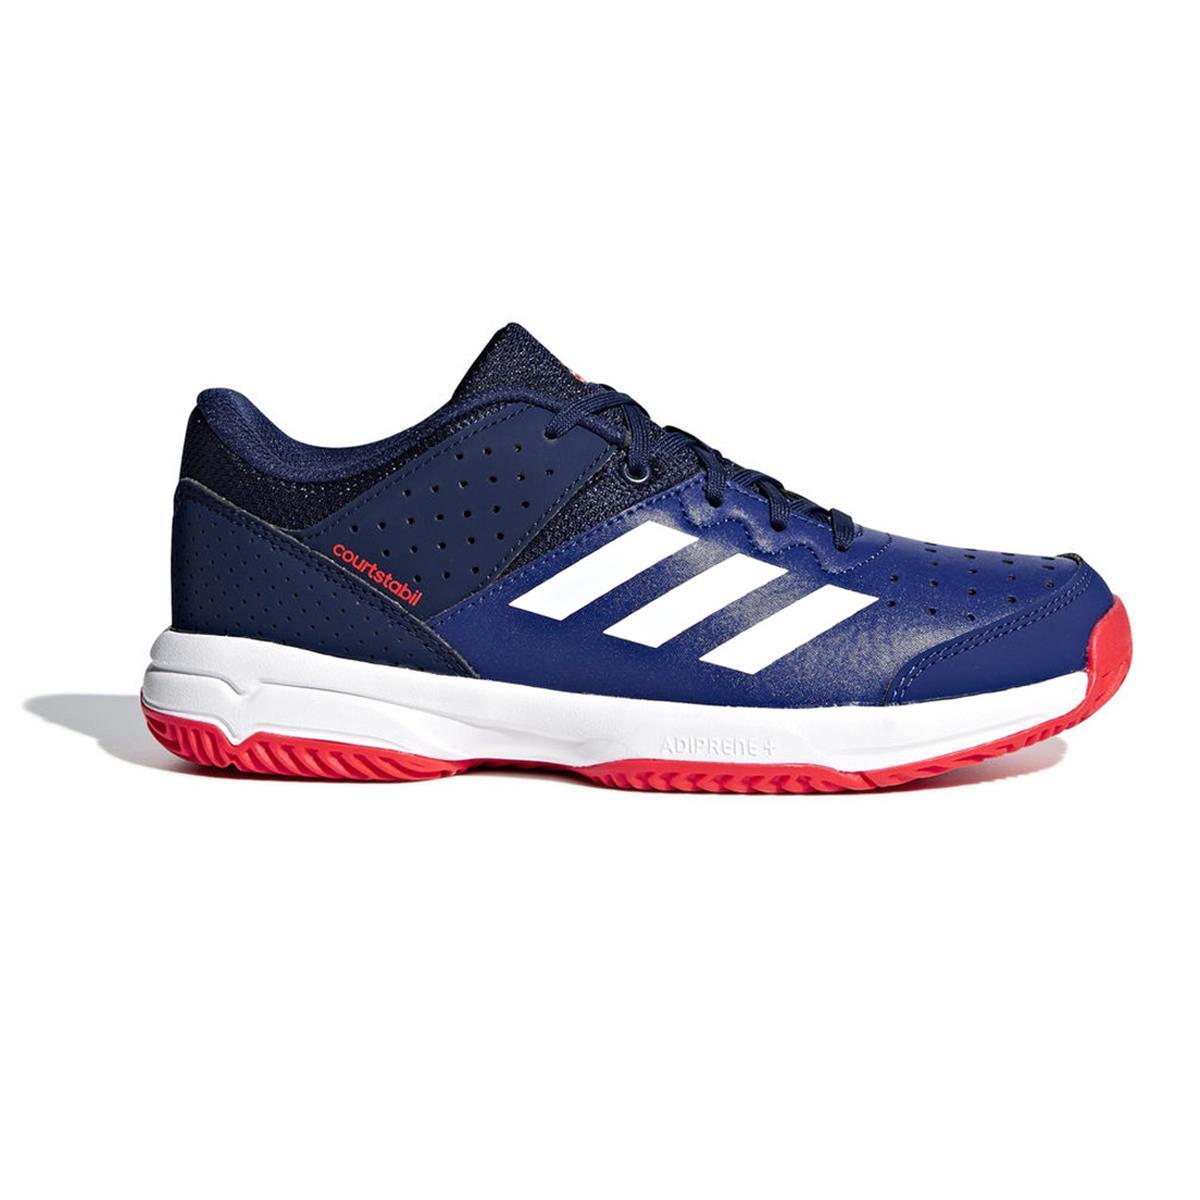 Adidas Direct Court Badminton Shoes Stabil Orange blue Junior rr6UwY